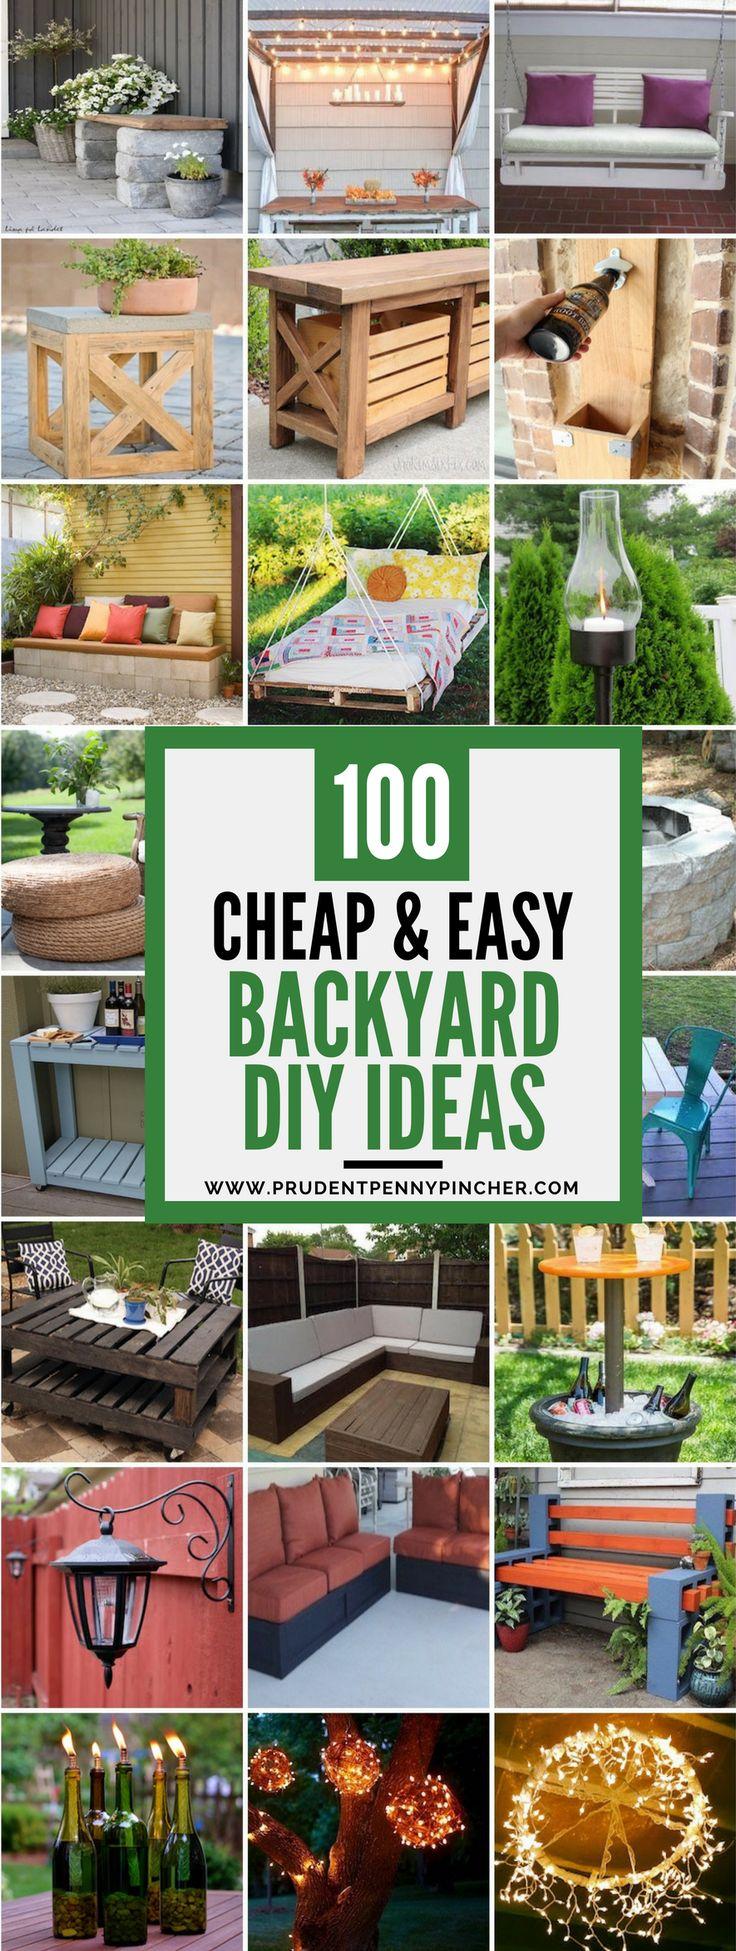 Backyard Design Ideas On A Budget 100 Cheap And Easy Diy Backyard Ideas